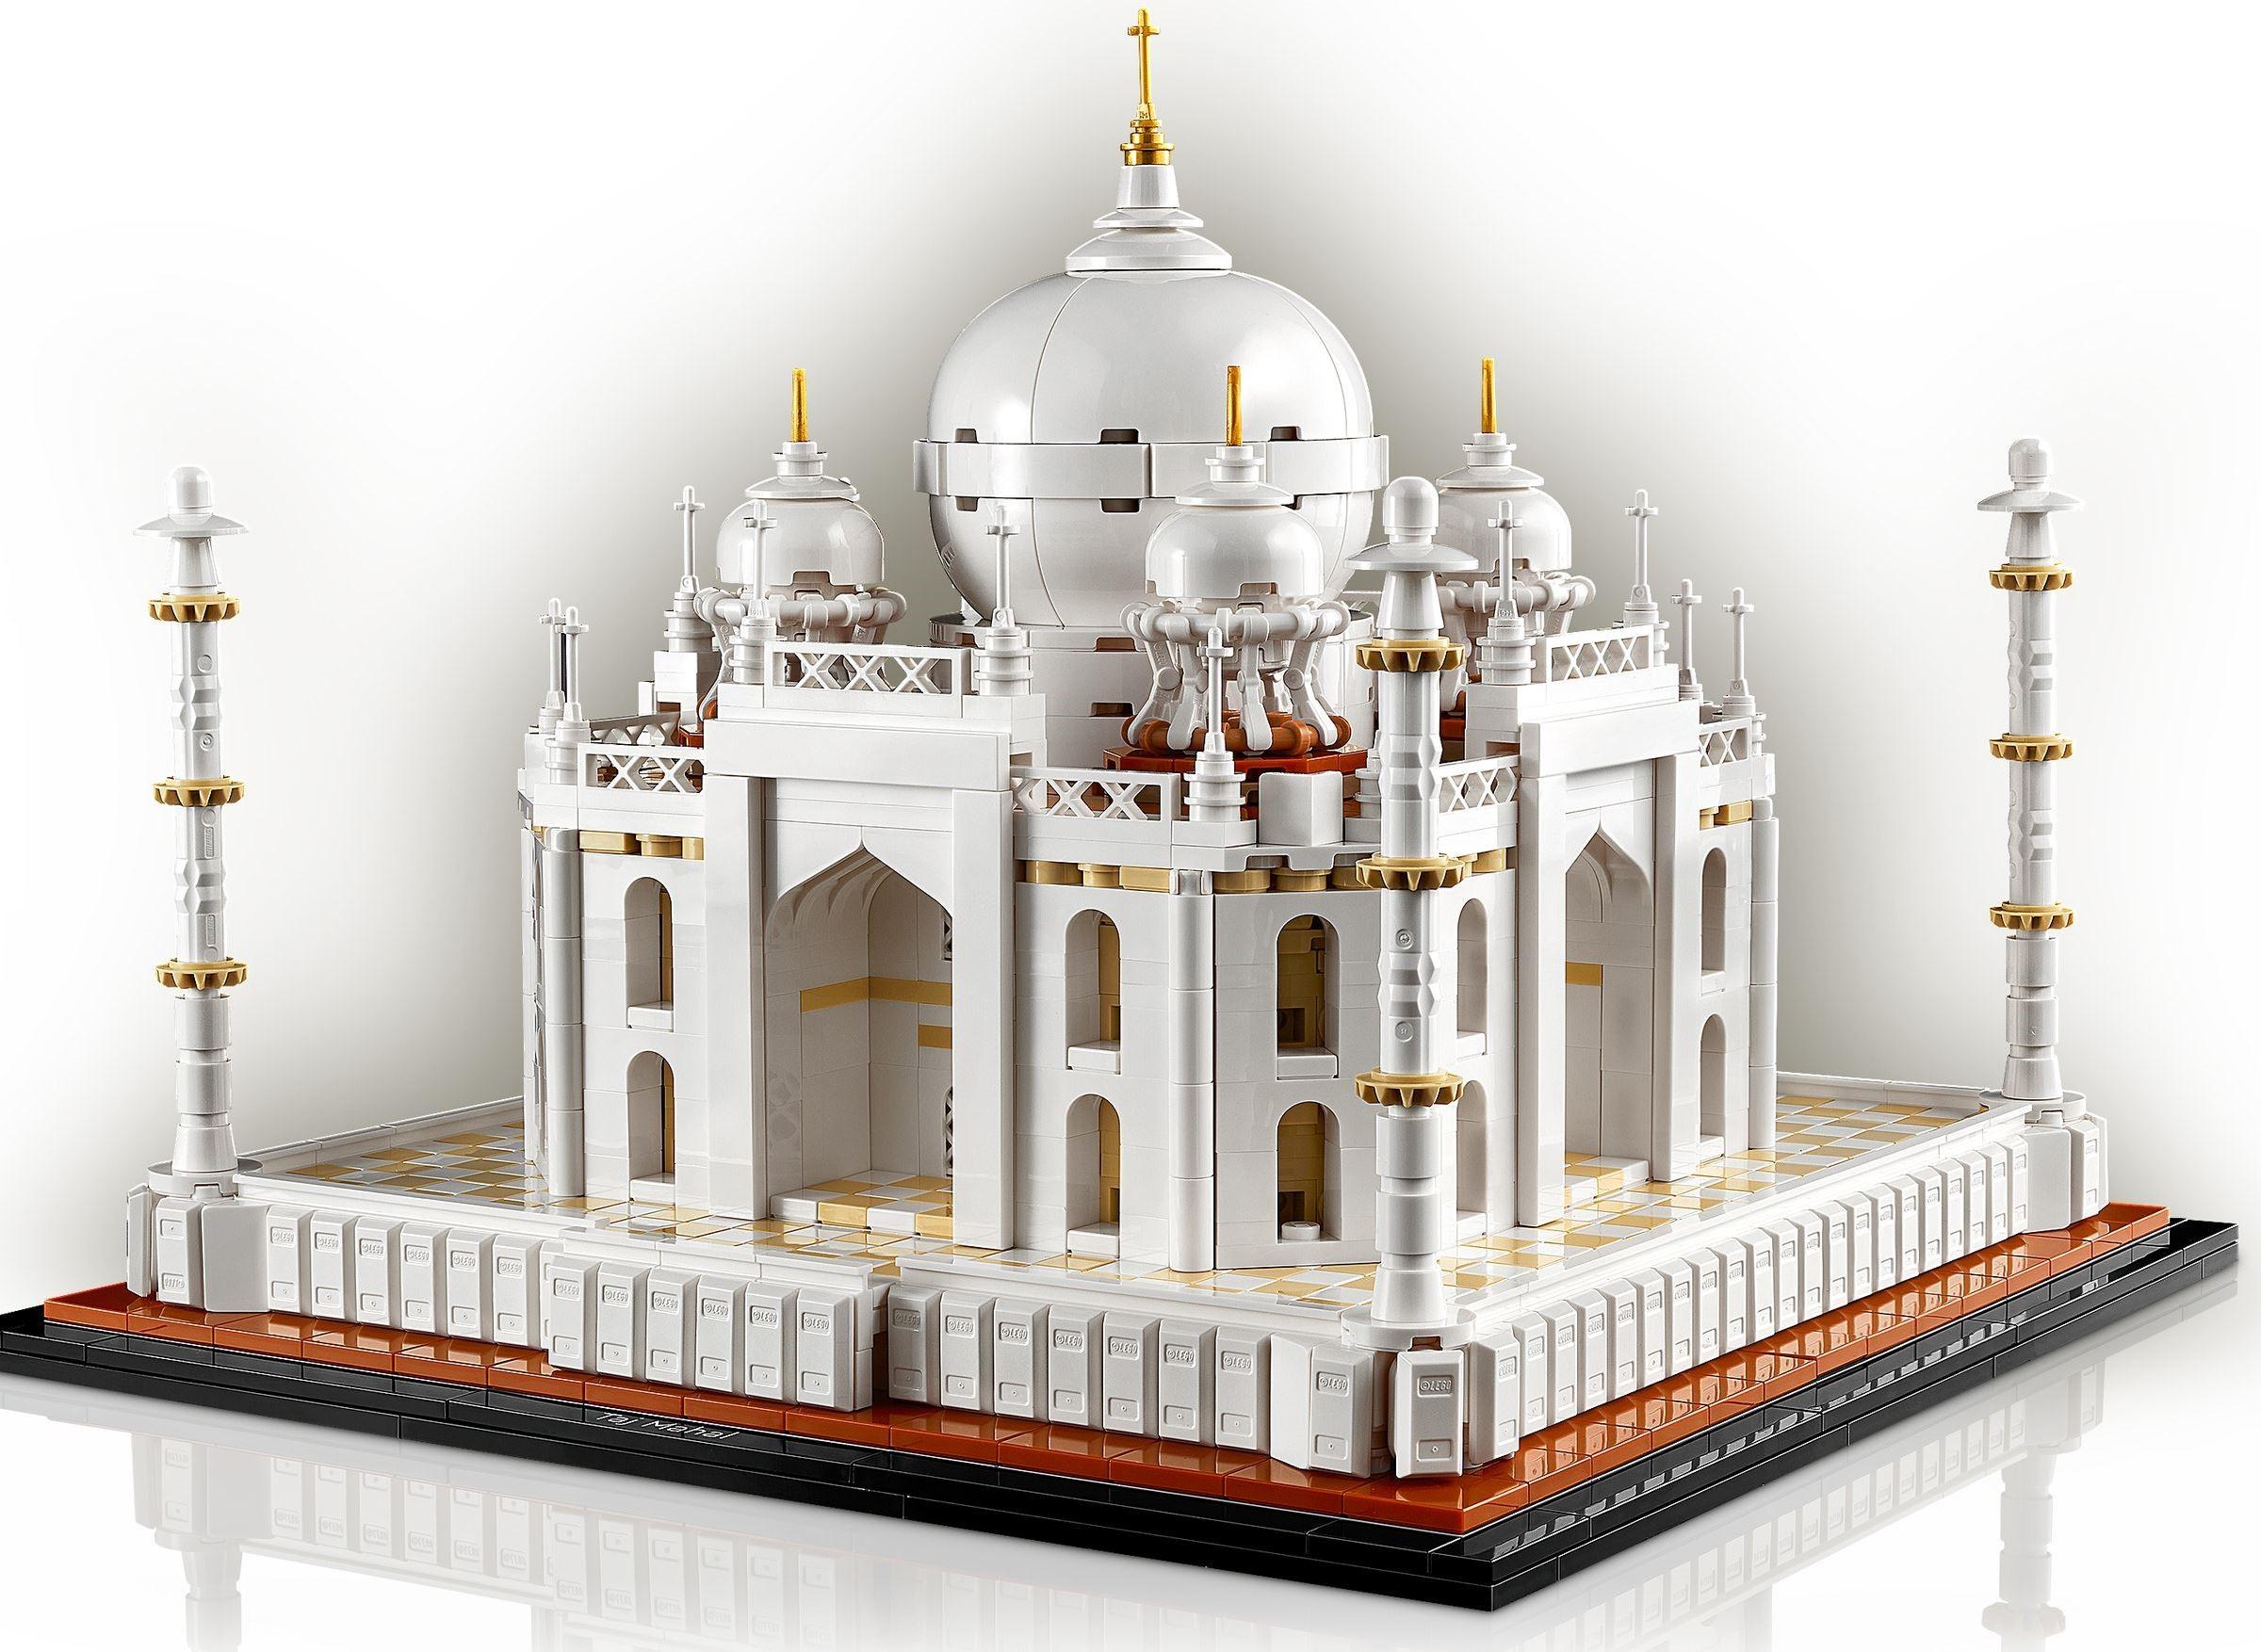 21056 LEGO Architecture Landmark Series Taj Mahal – Công trình kiến trúc Tajmahal